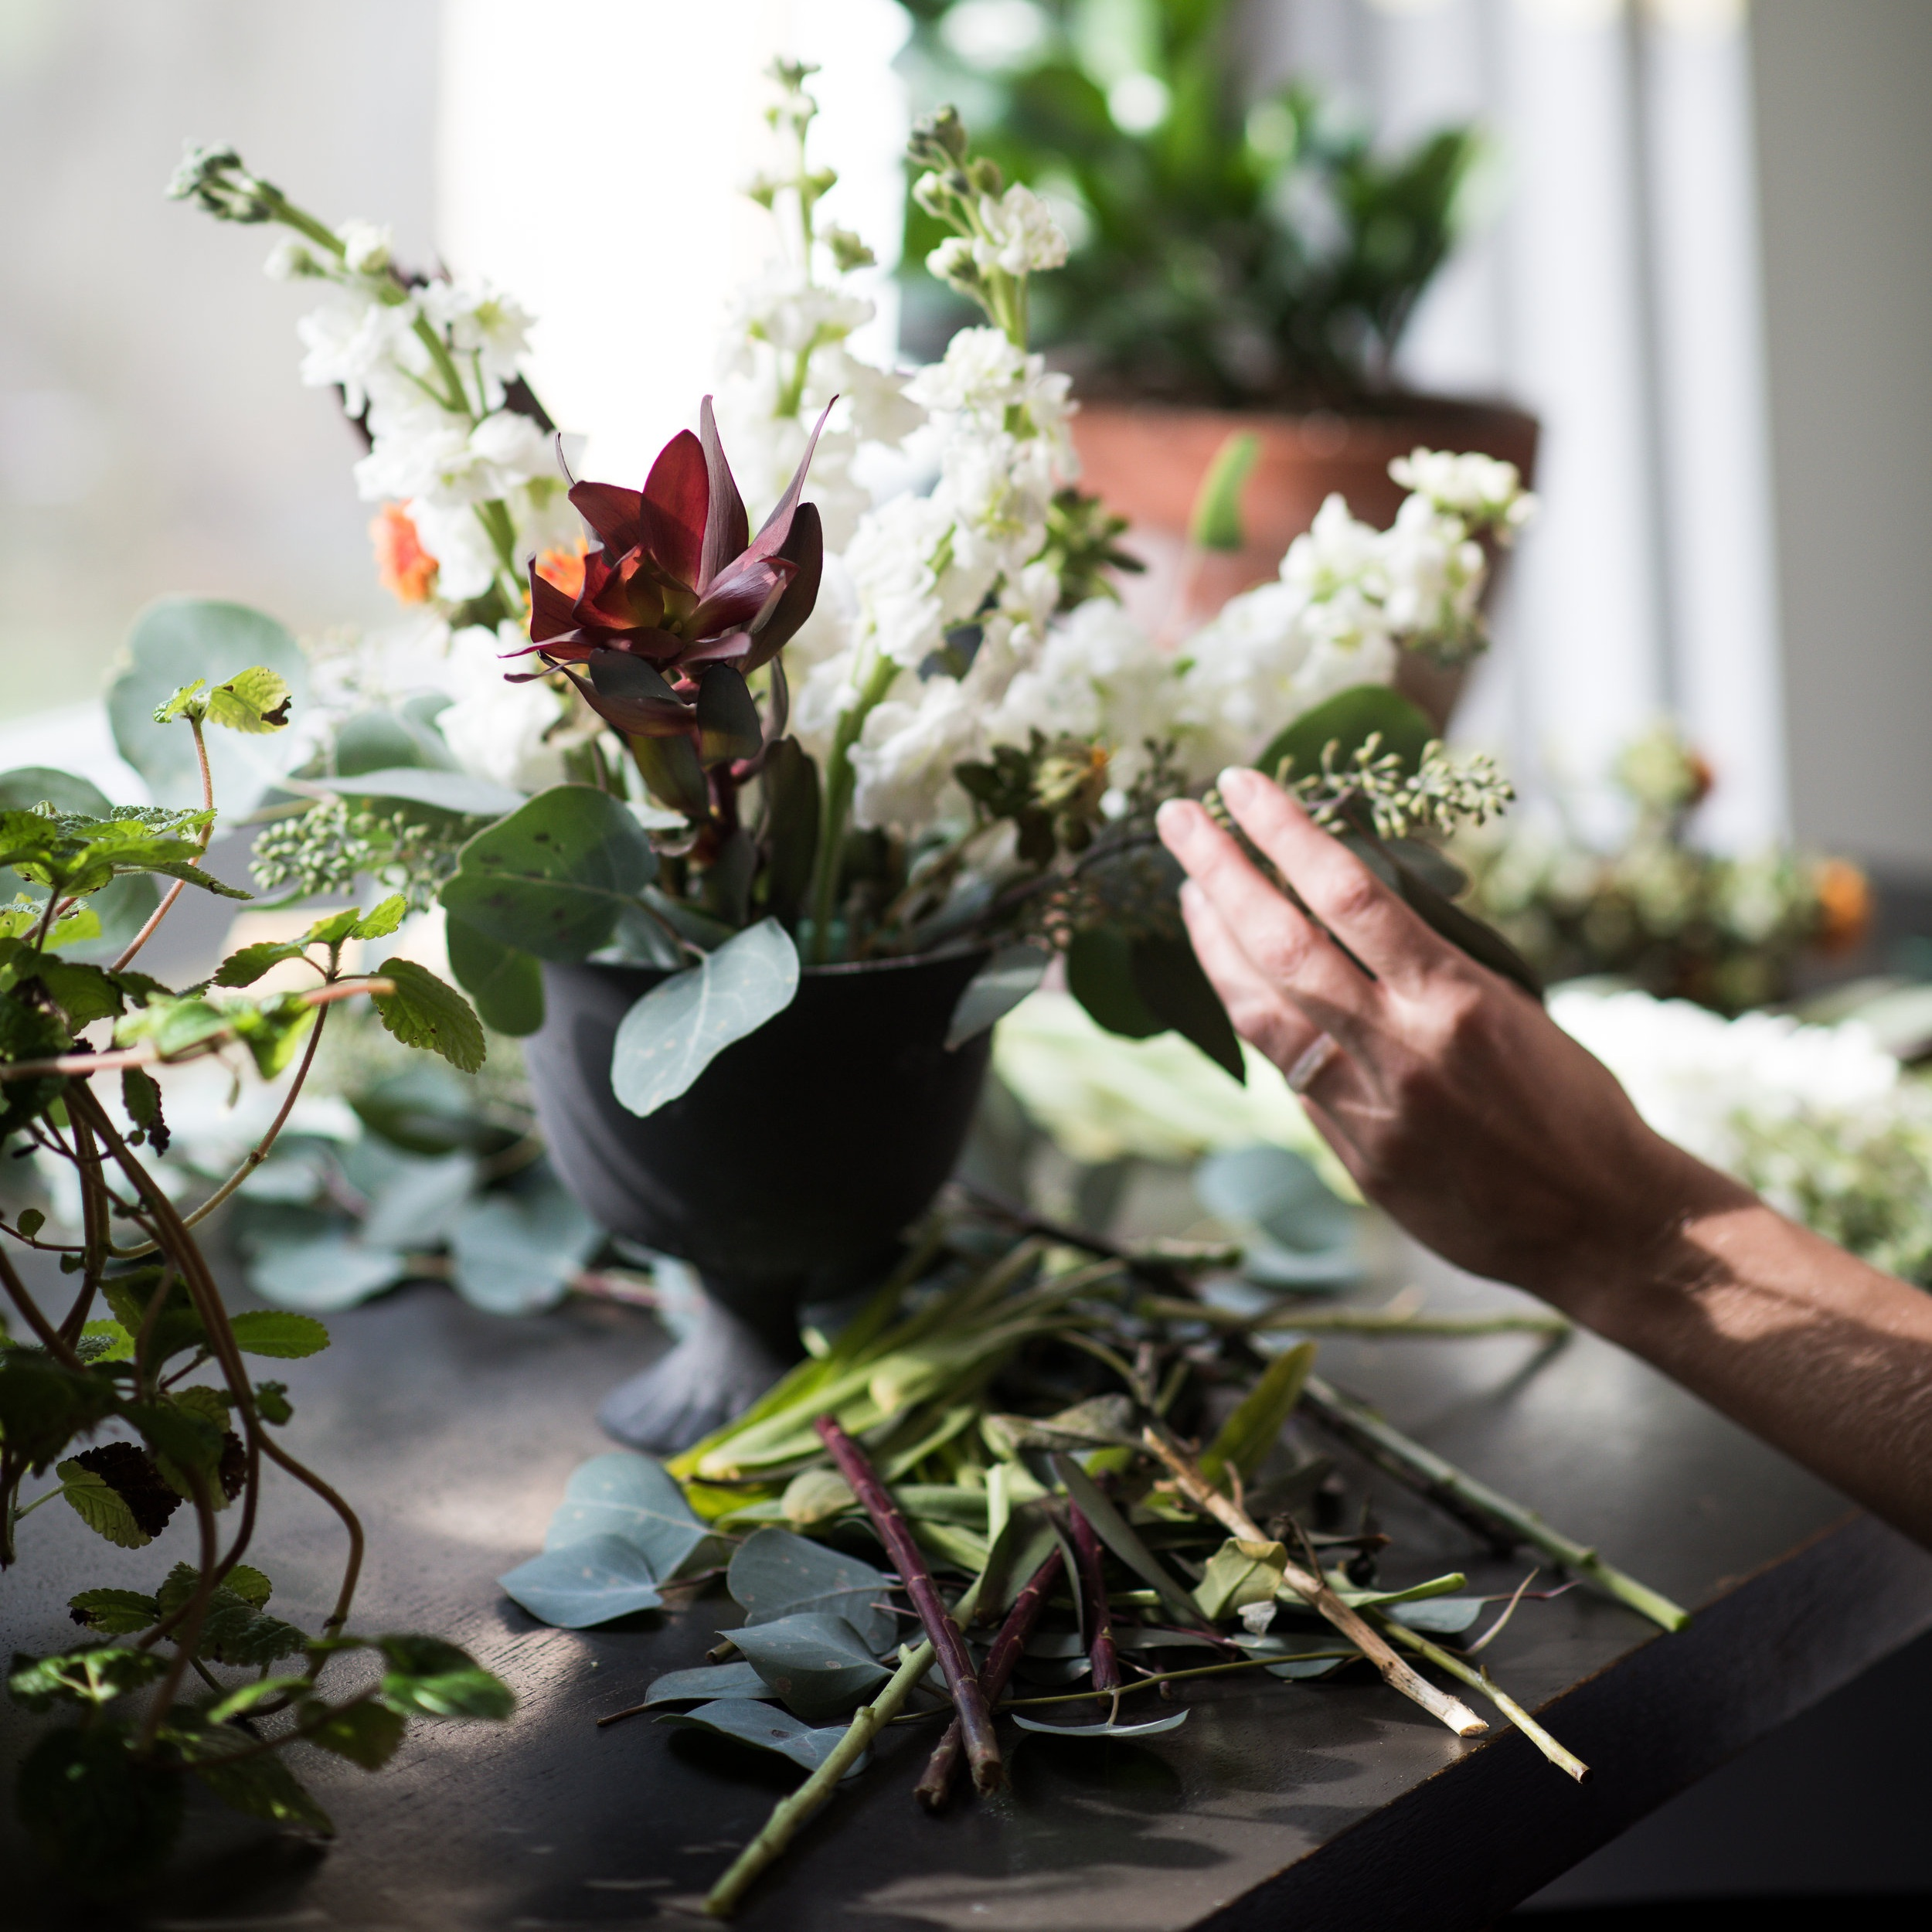 Behind-the-scenes - Floral